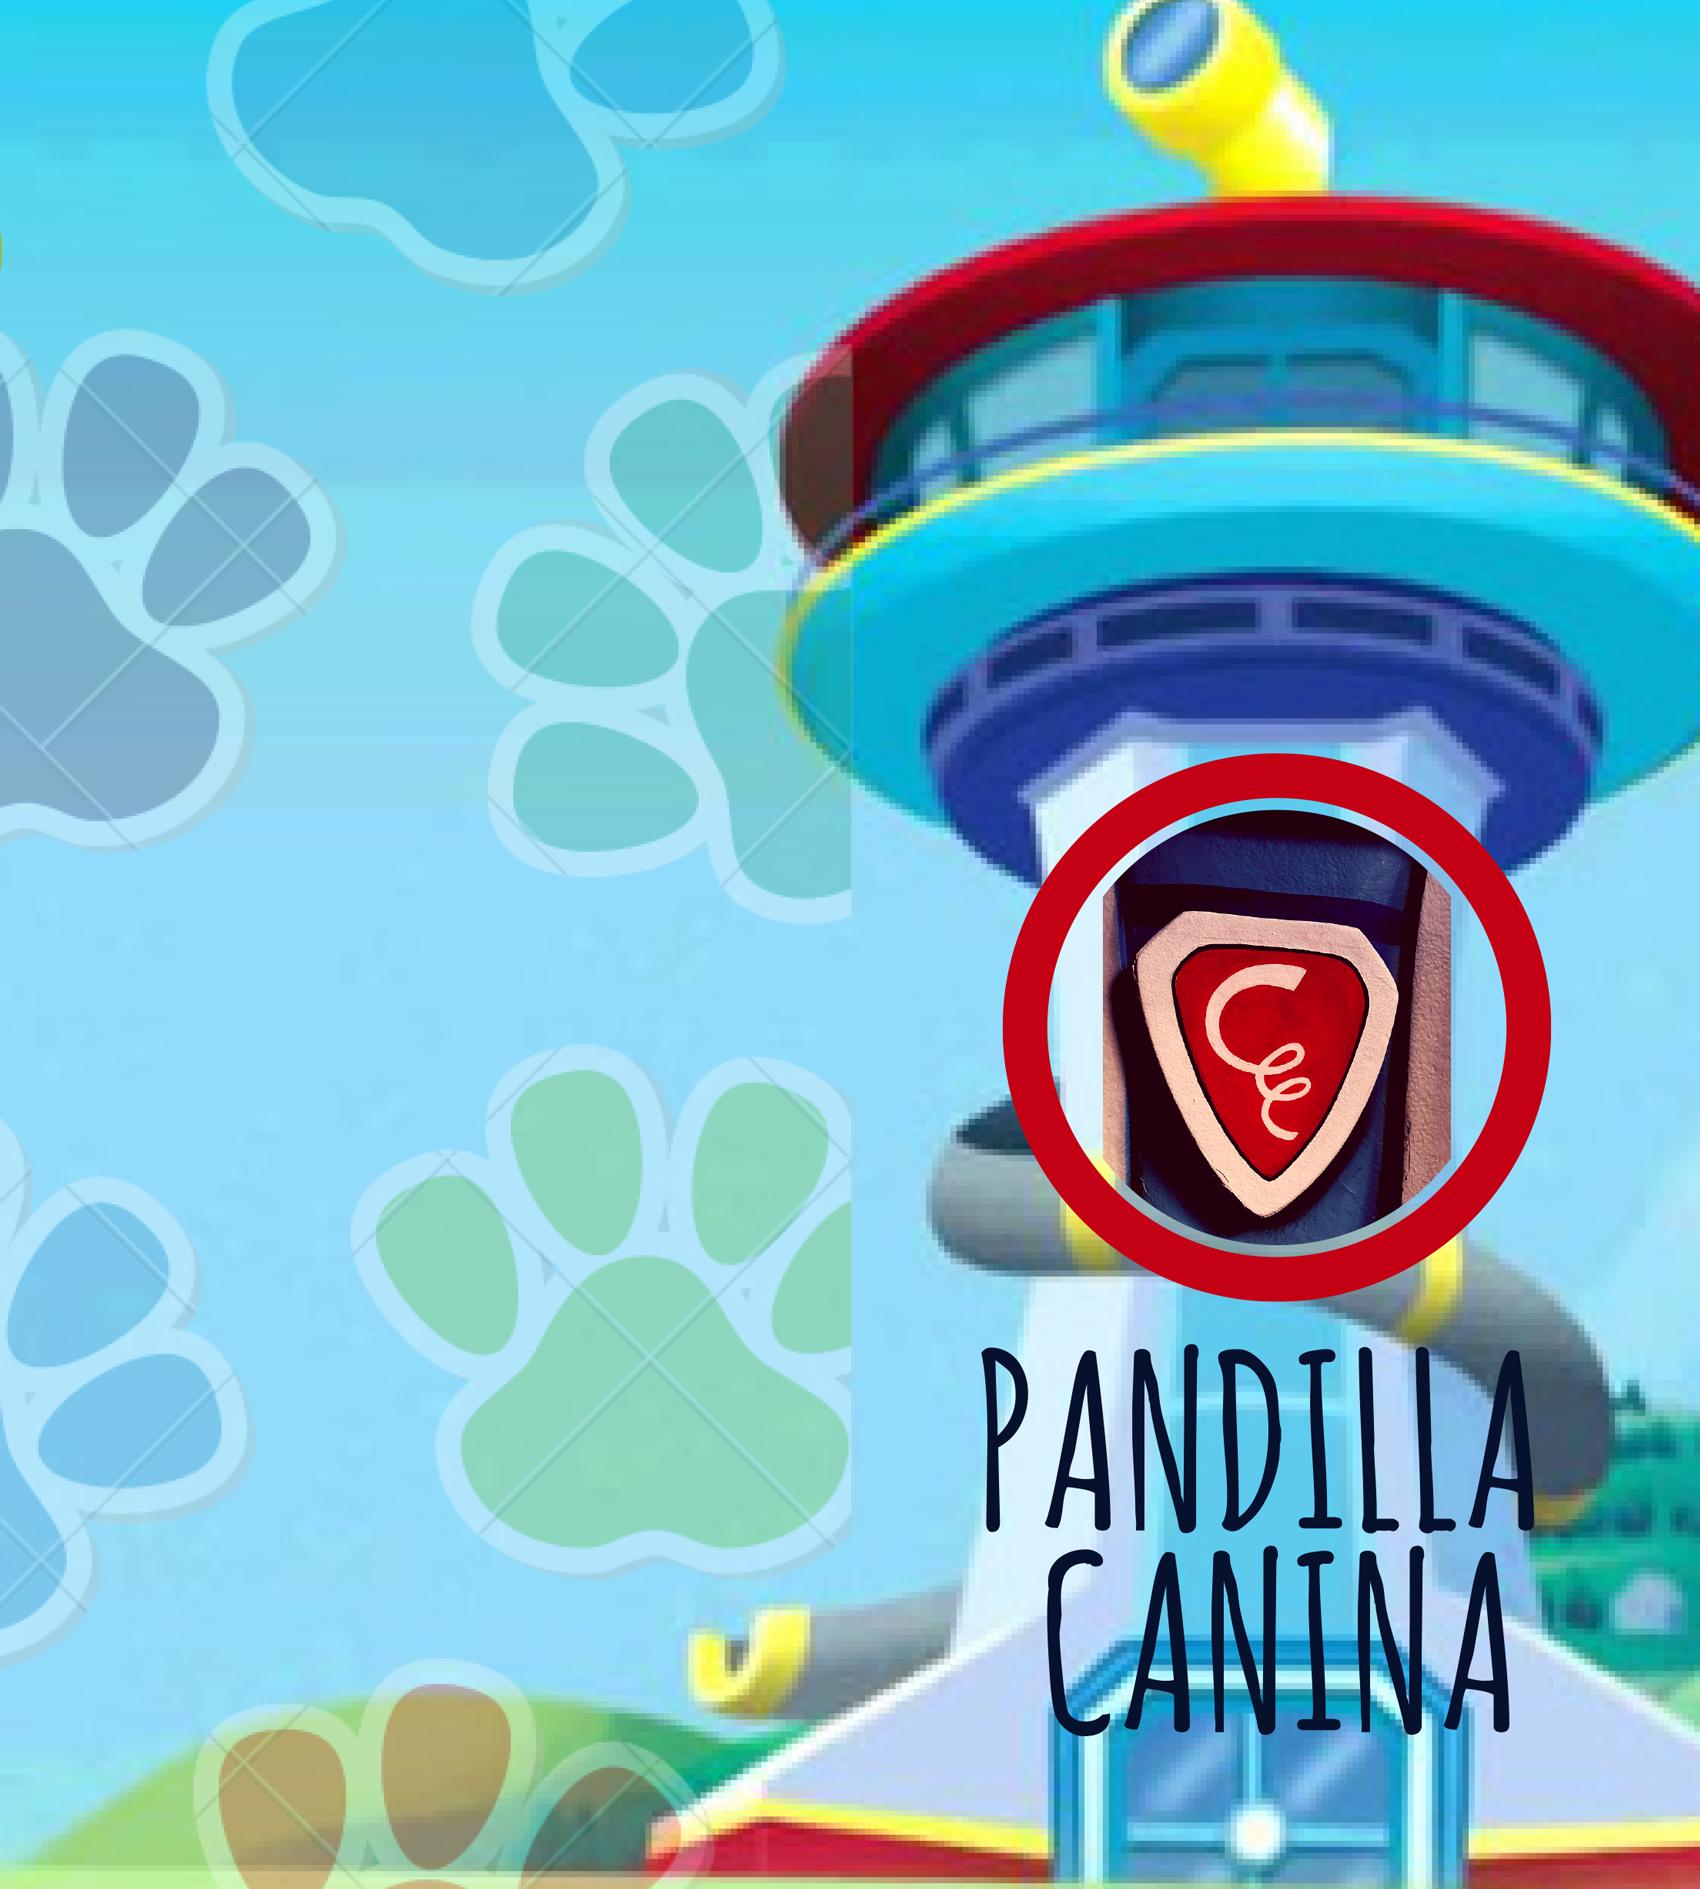 PANDILLA-CANINA